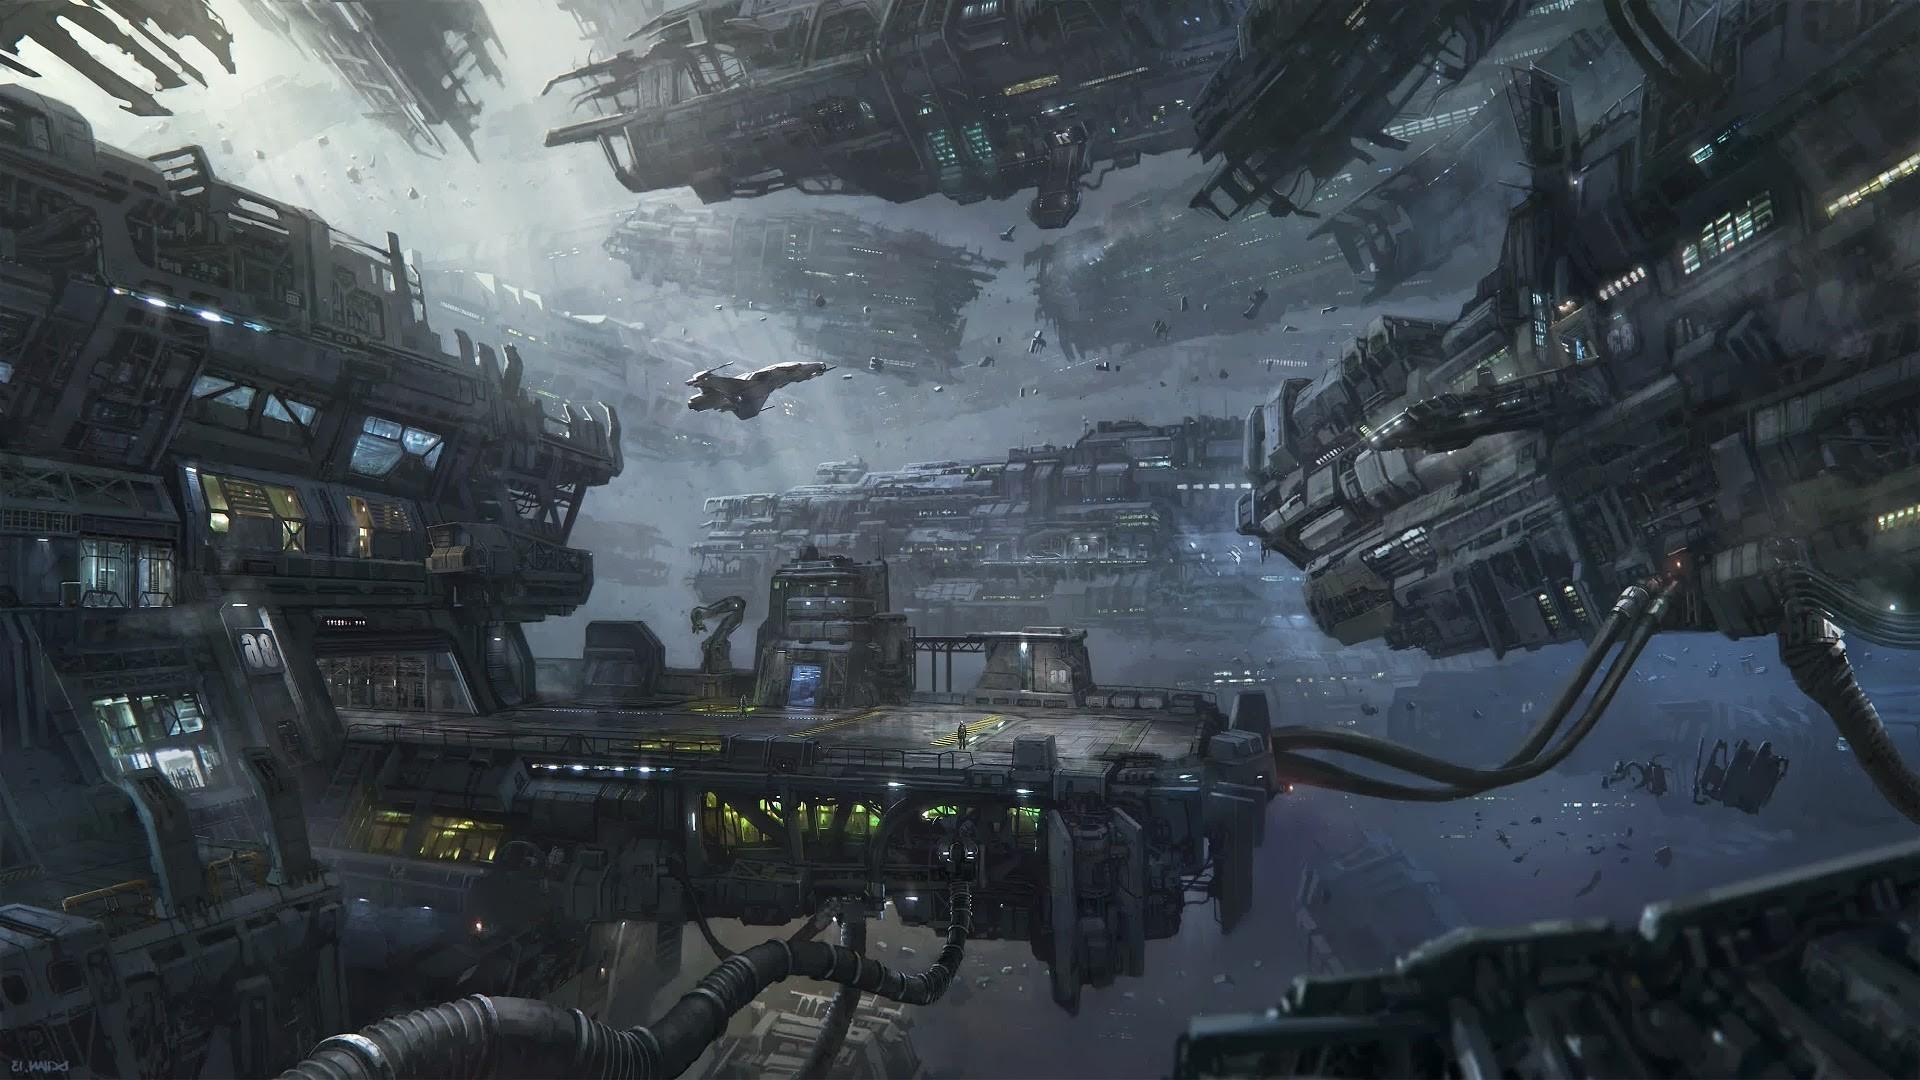 Titan Fall 2 Hd Wallpaper Space Spaceship Star Citizen Wallpapers Hd Desktop And